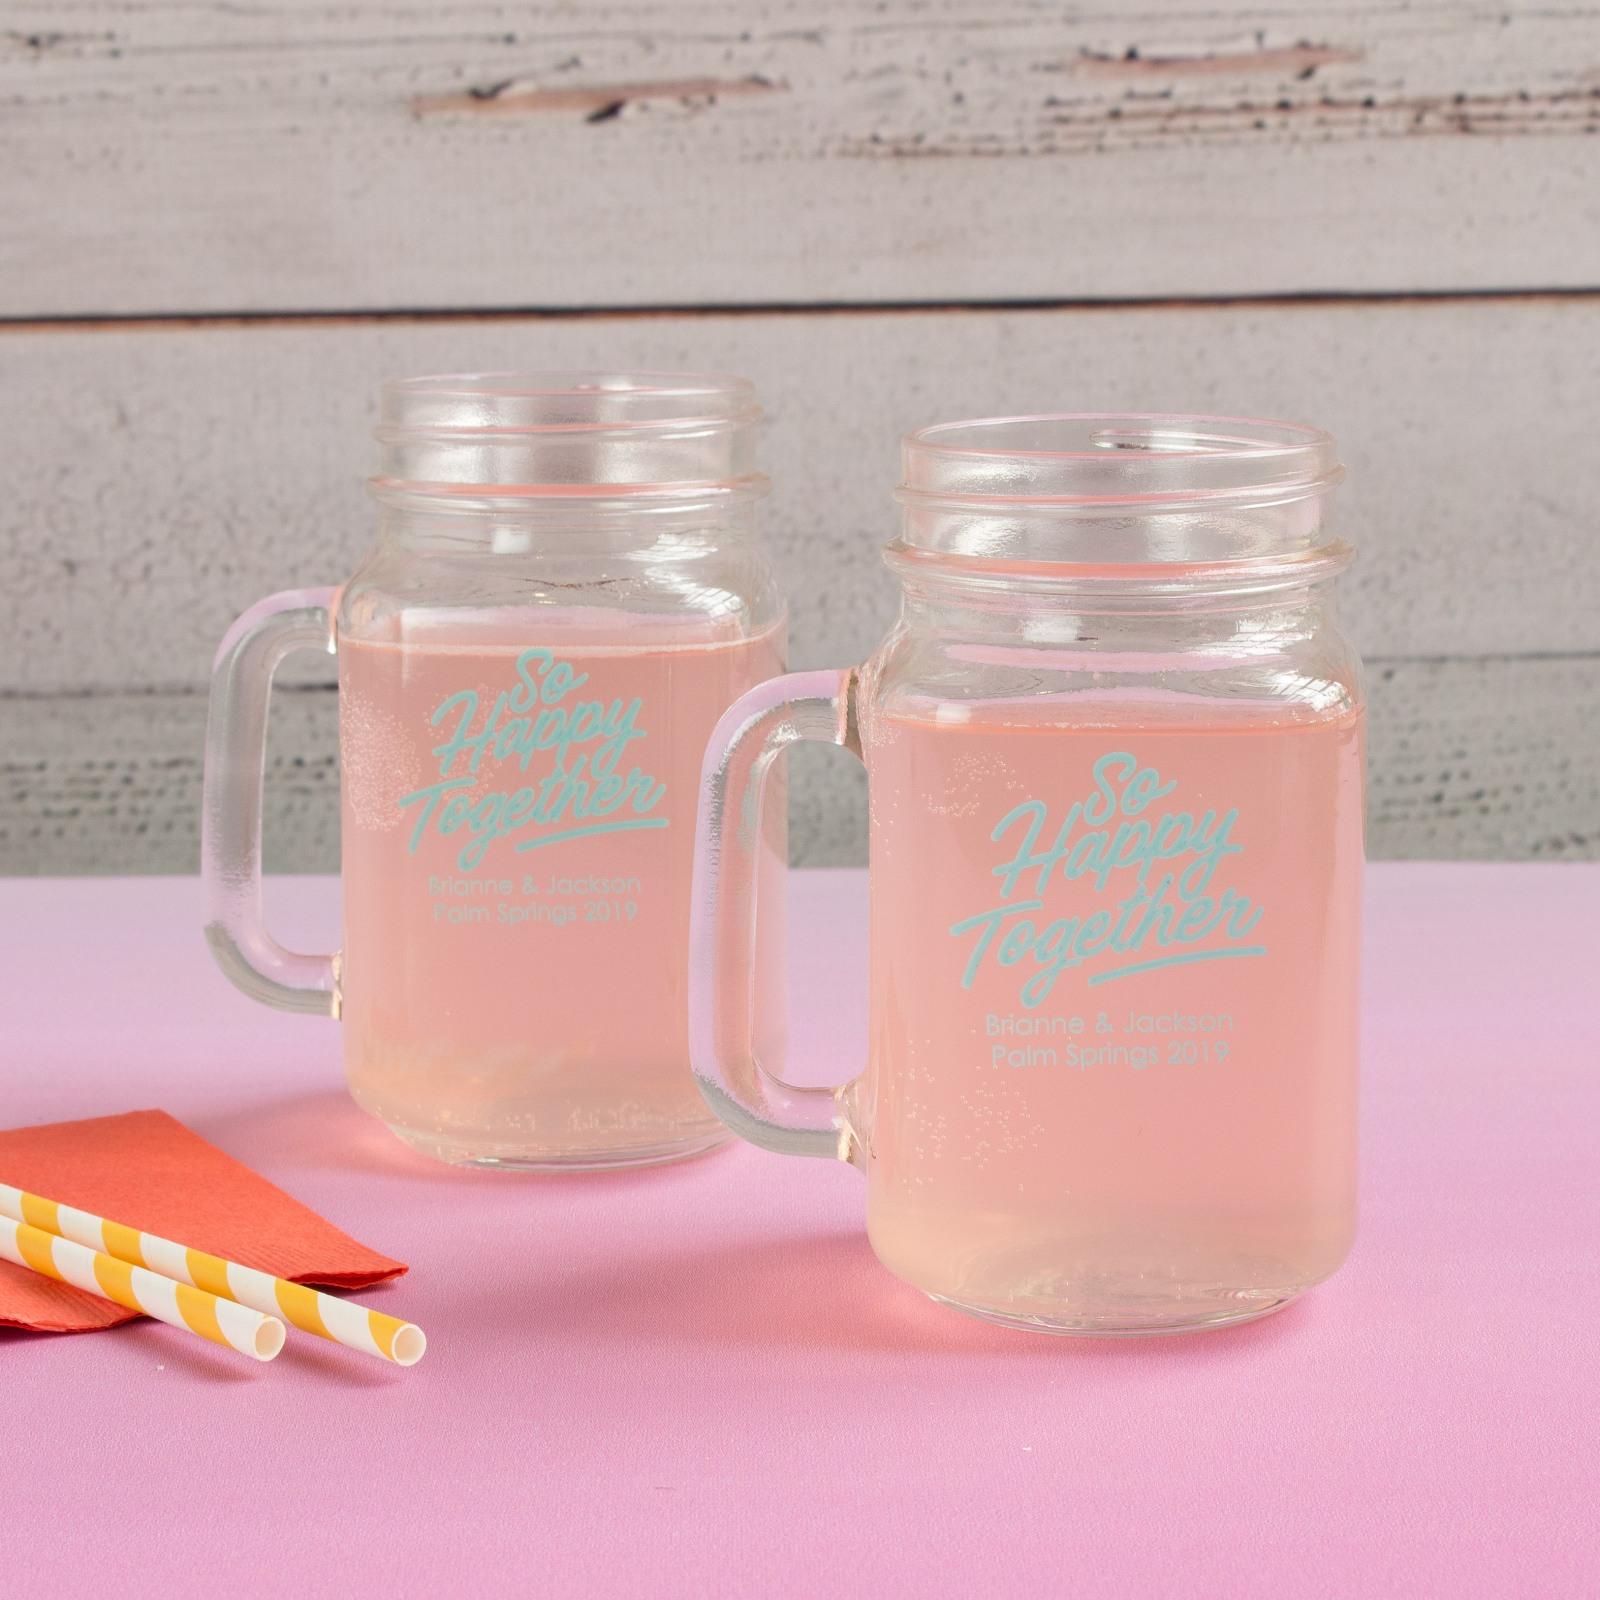 Personalized Happy Together Mason Jar Mugs